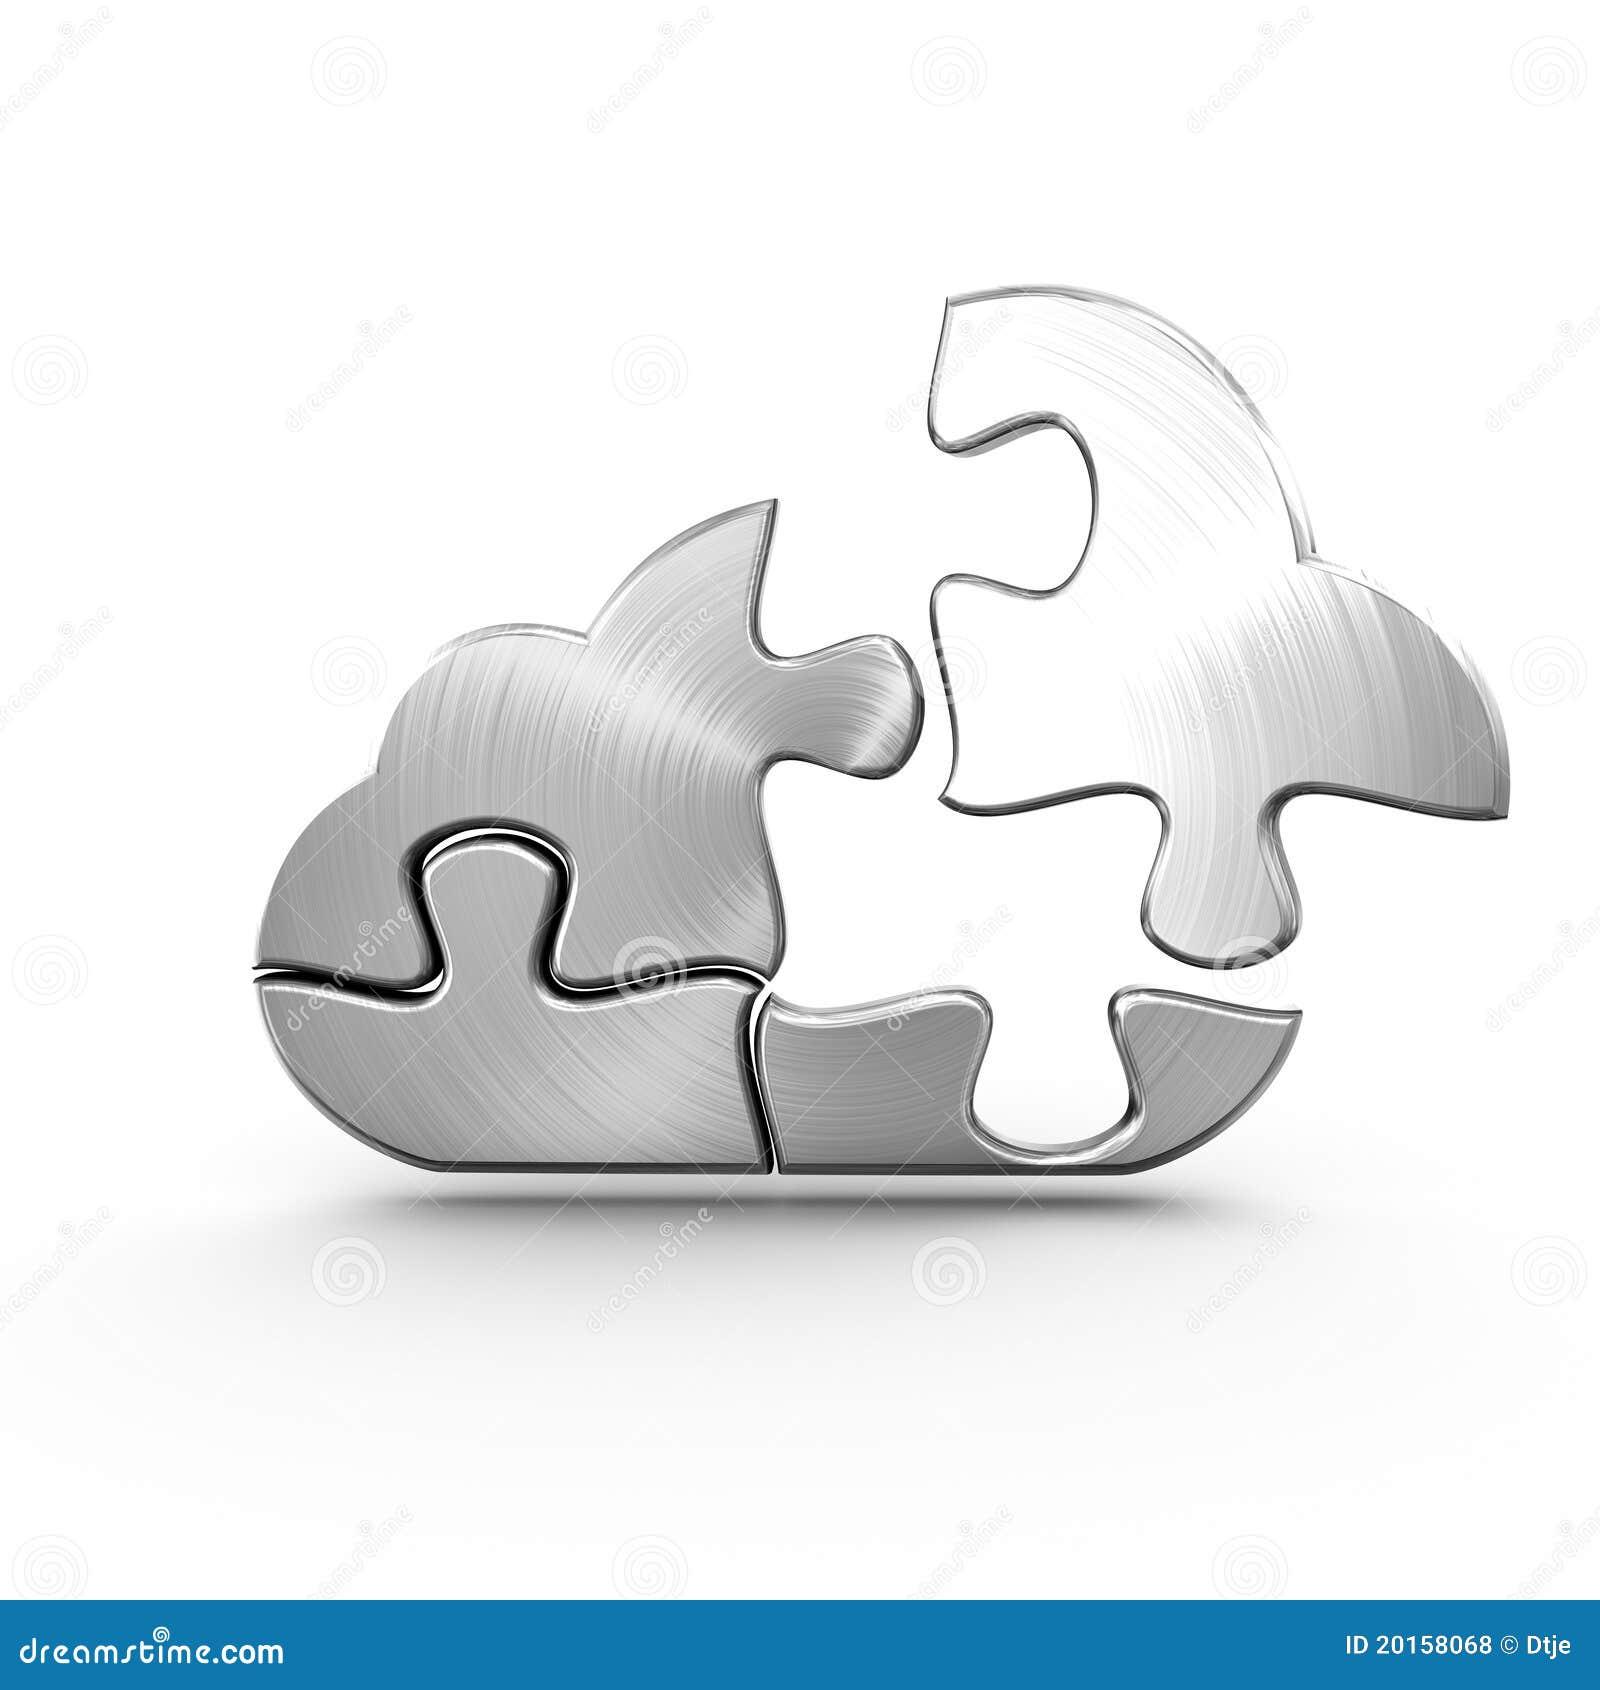 Building a Cloud computing